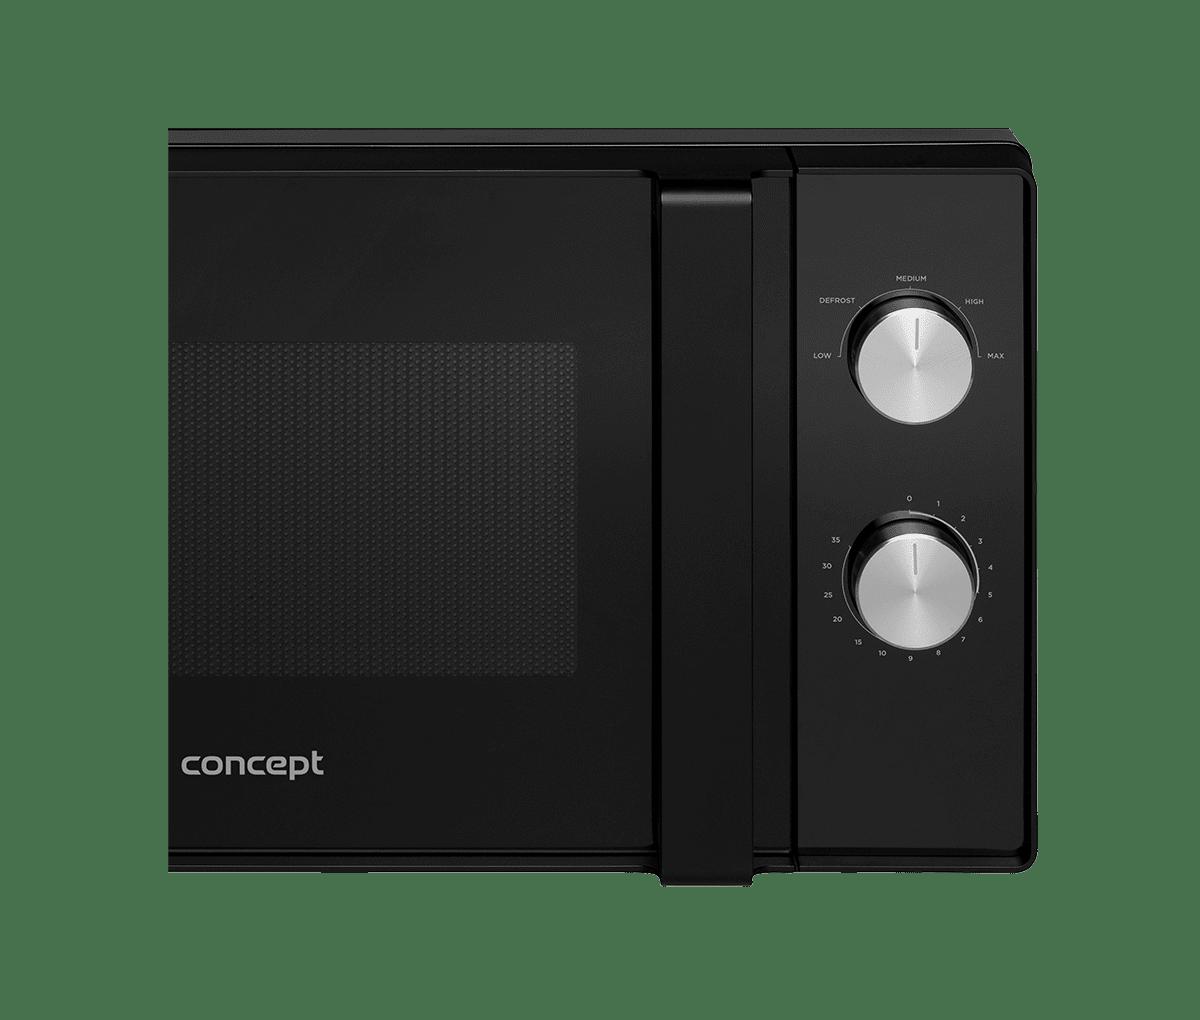 Concept MT4020bc, Tárolás és funkció